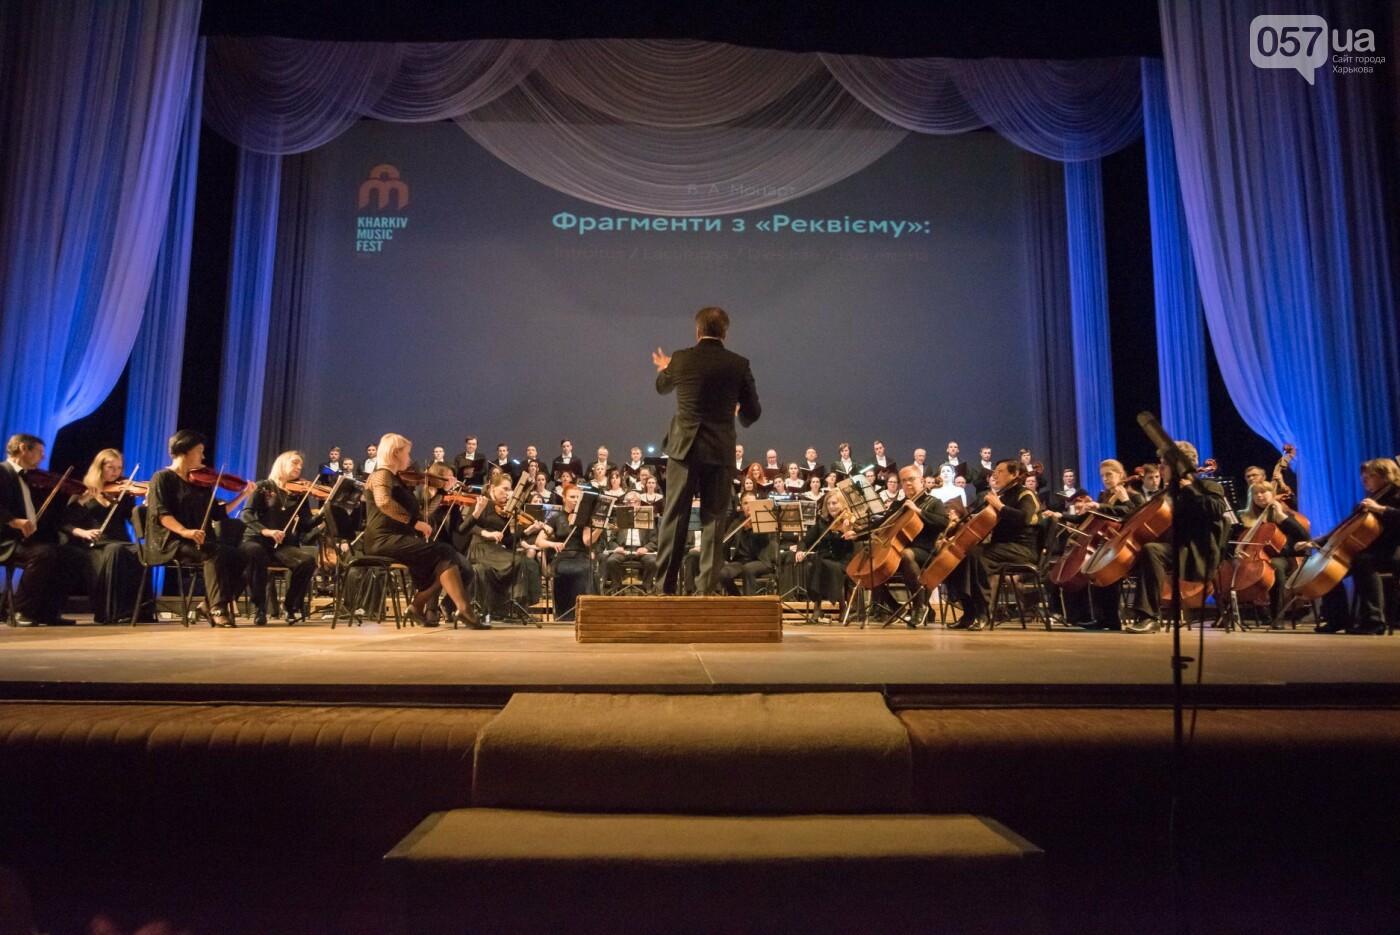 Харьков приглашает на Kharkiv Music Fest, фото-1